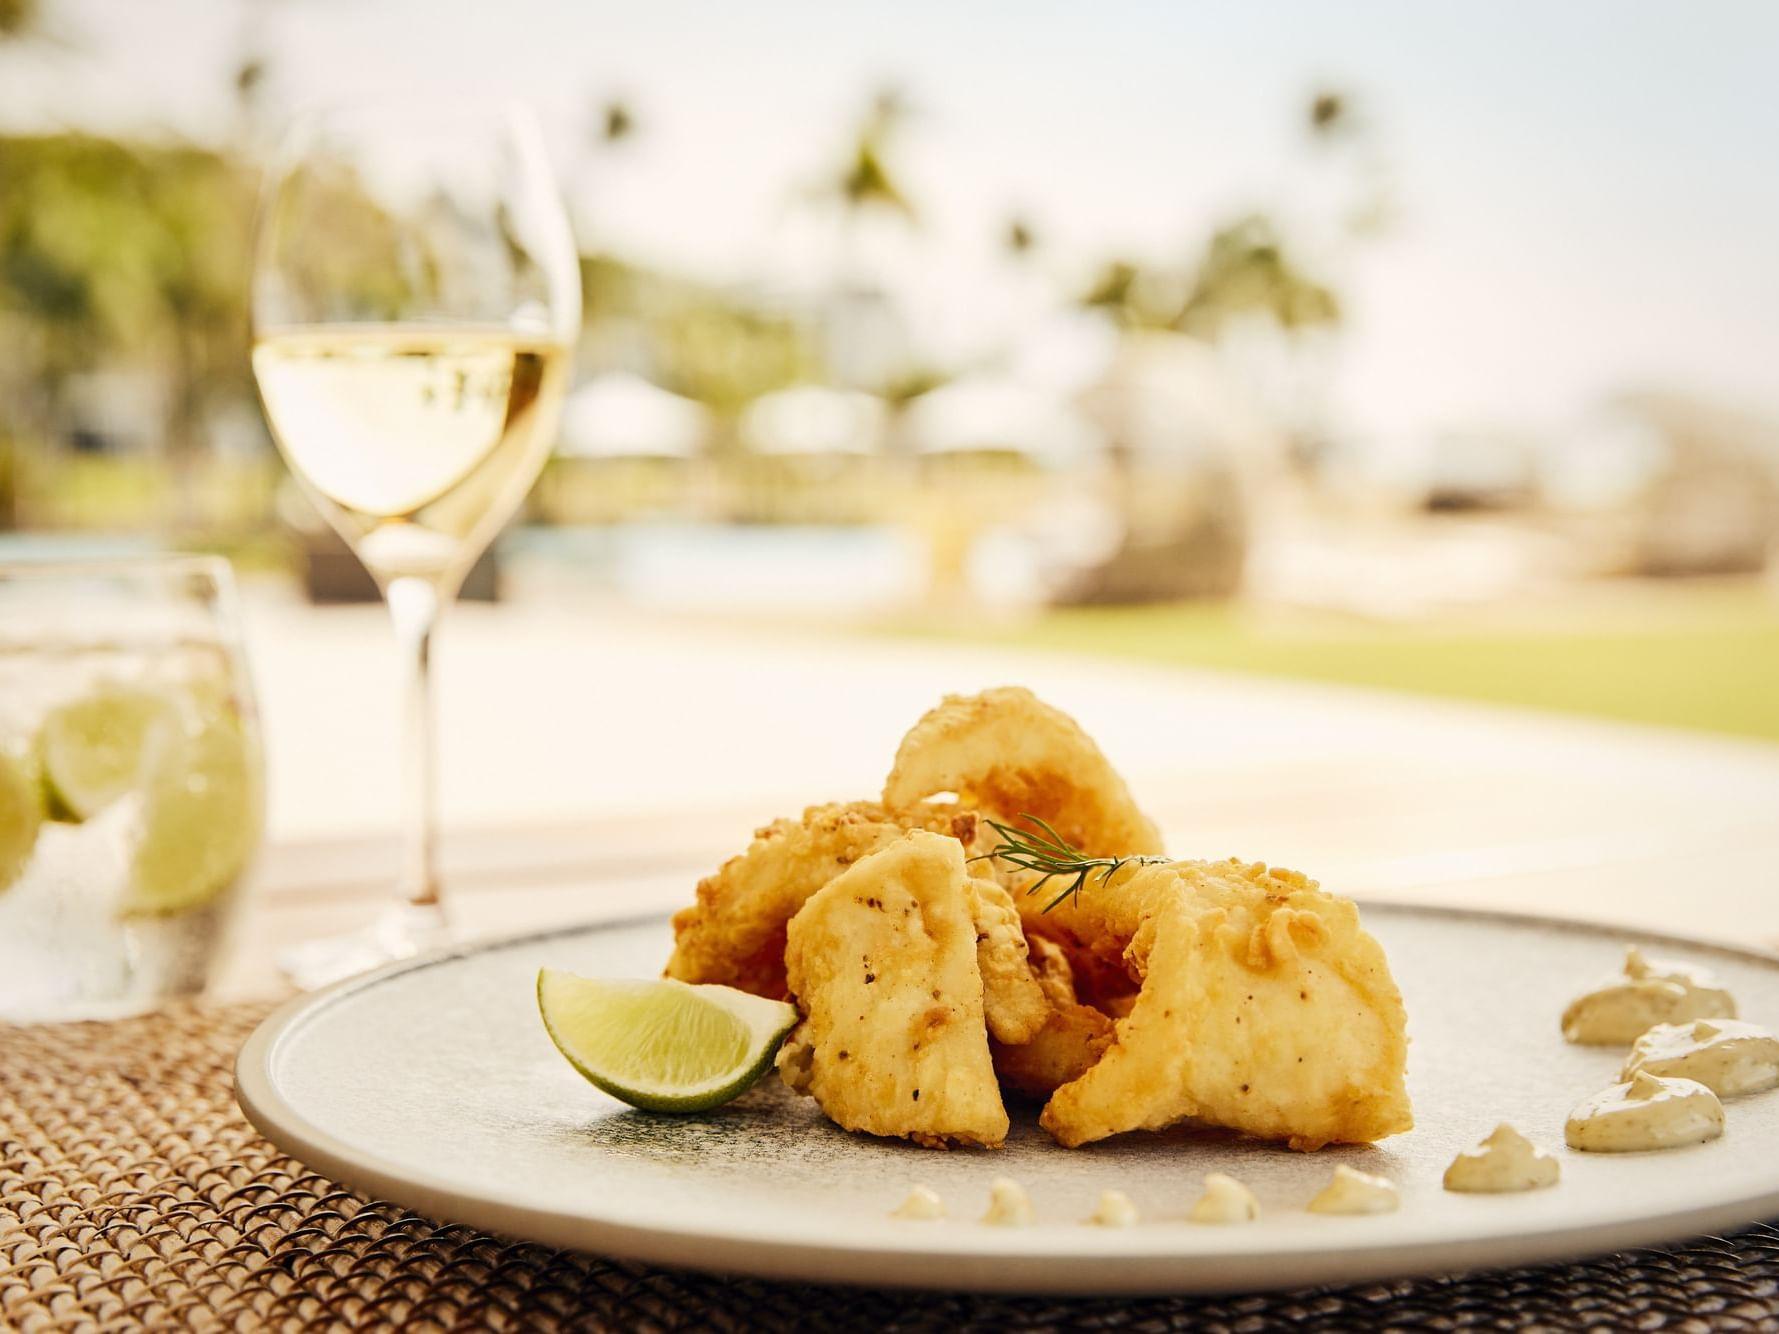 Calamari in Infinity Restaurant at Daydream Island Resort